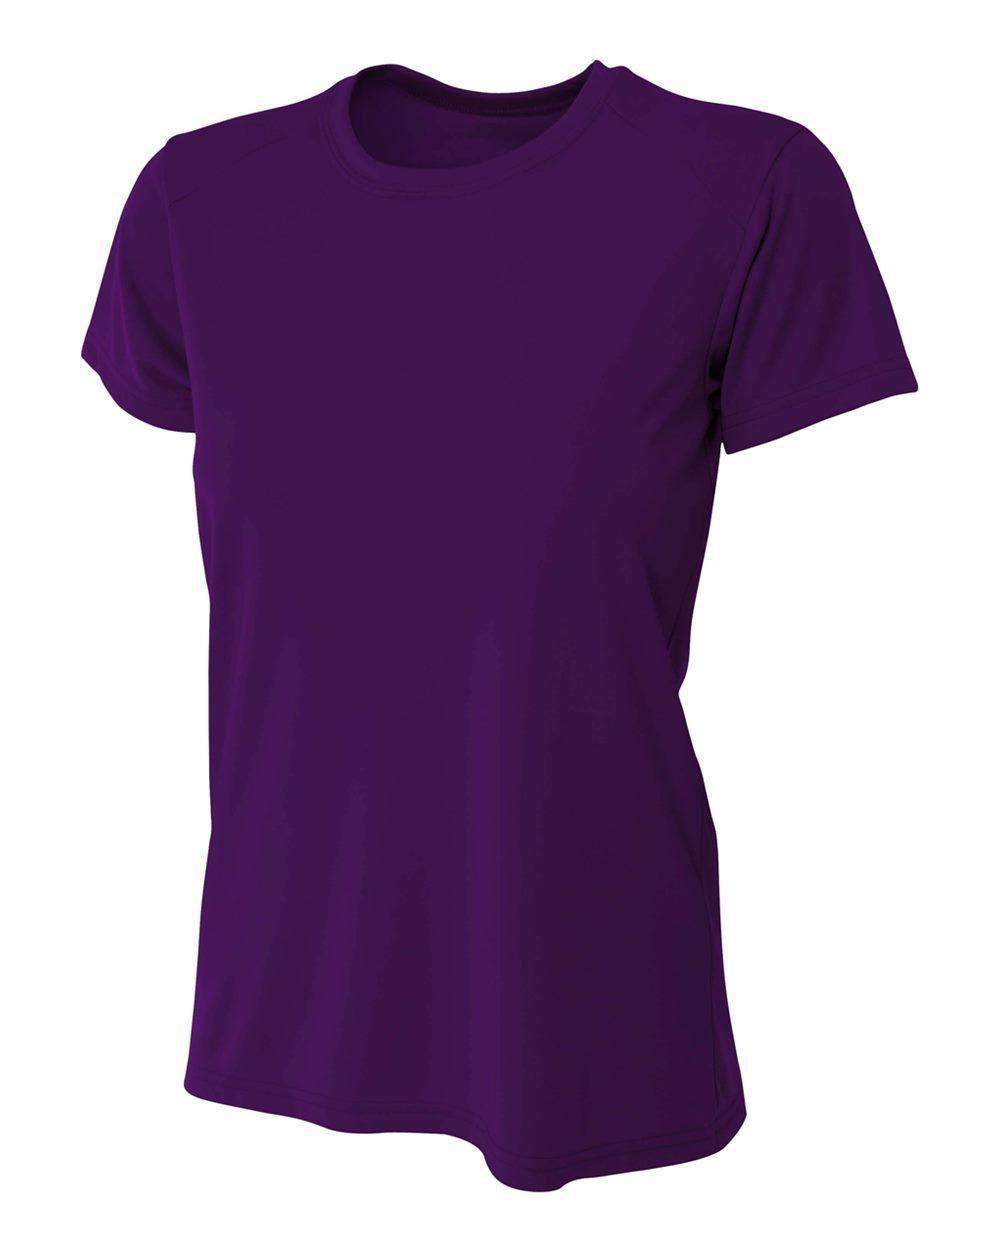 womens-polo-mwicking-purple.jpg